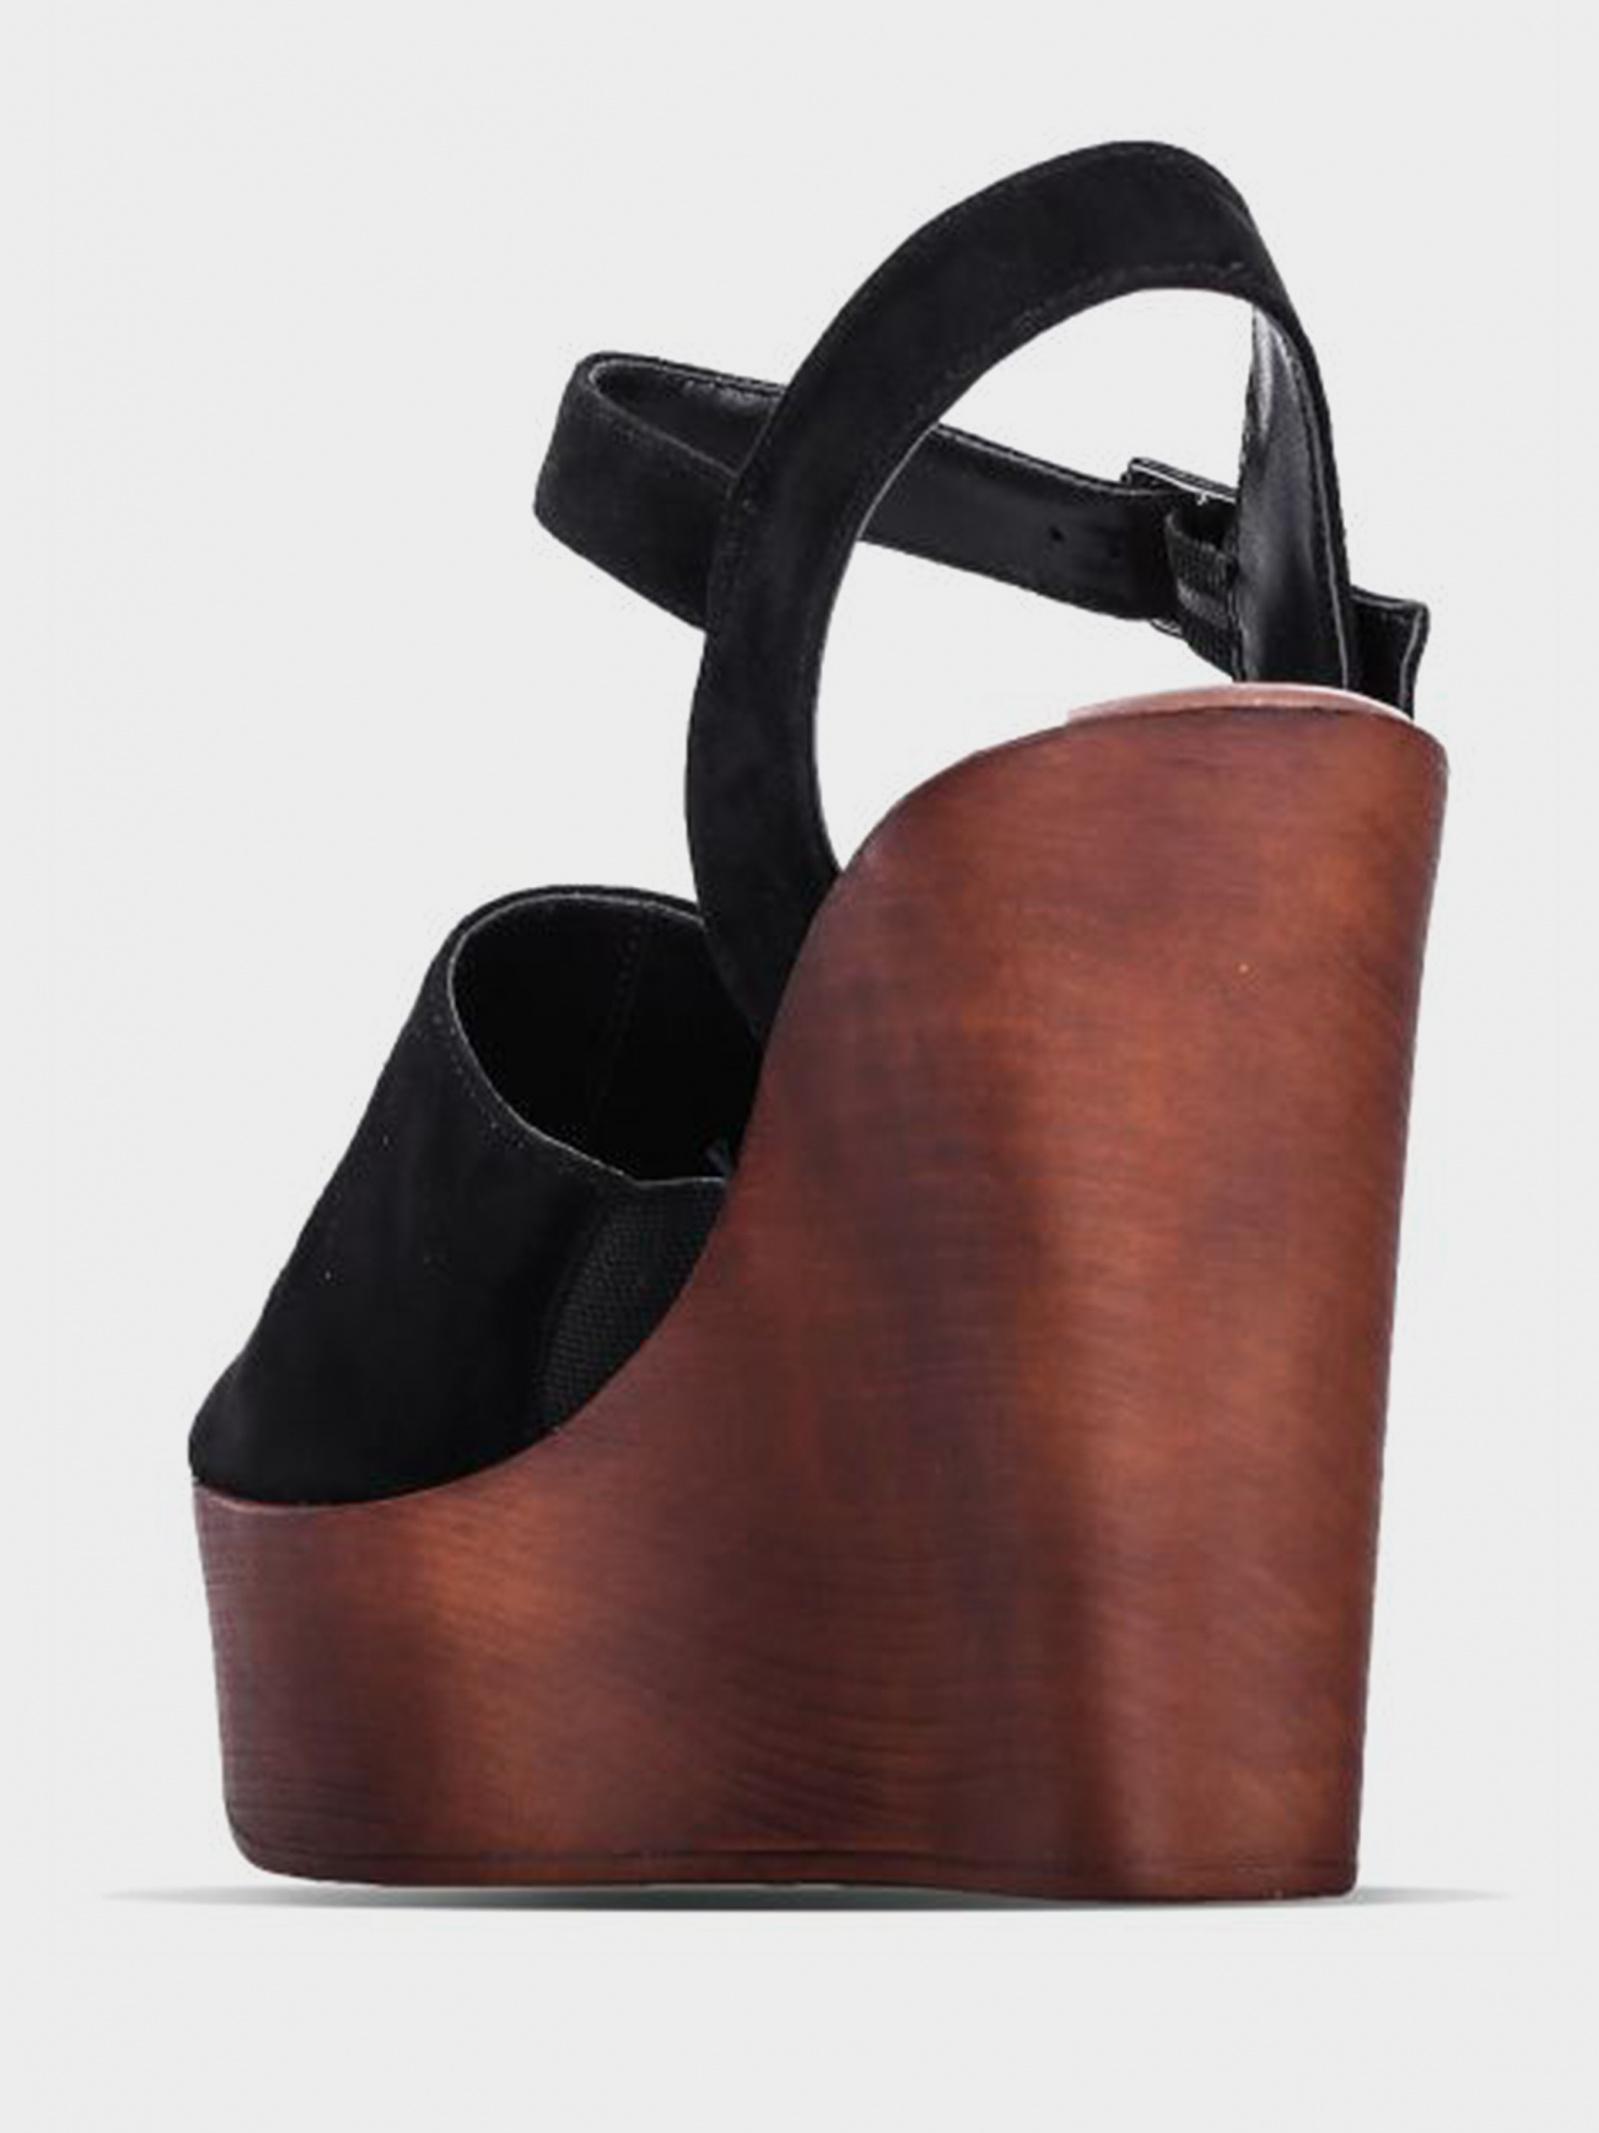 Босоніжки  для жінок Steve Madden BELLINI SM11000432 BLACK SUEDE безкоштовна доставка, 2017